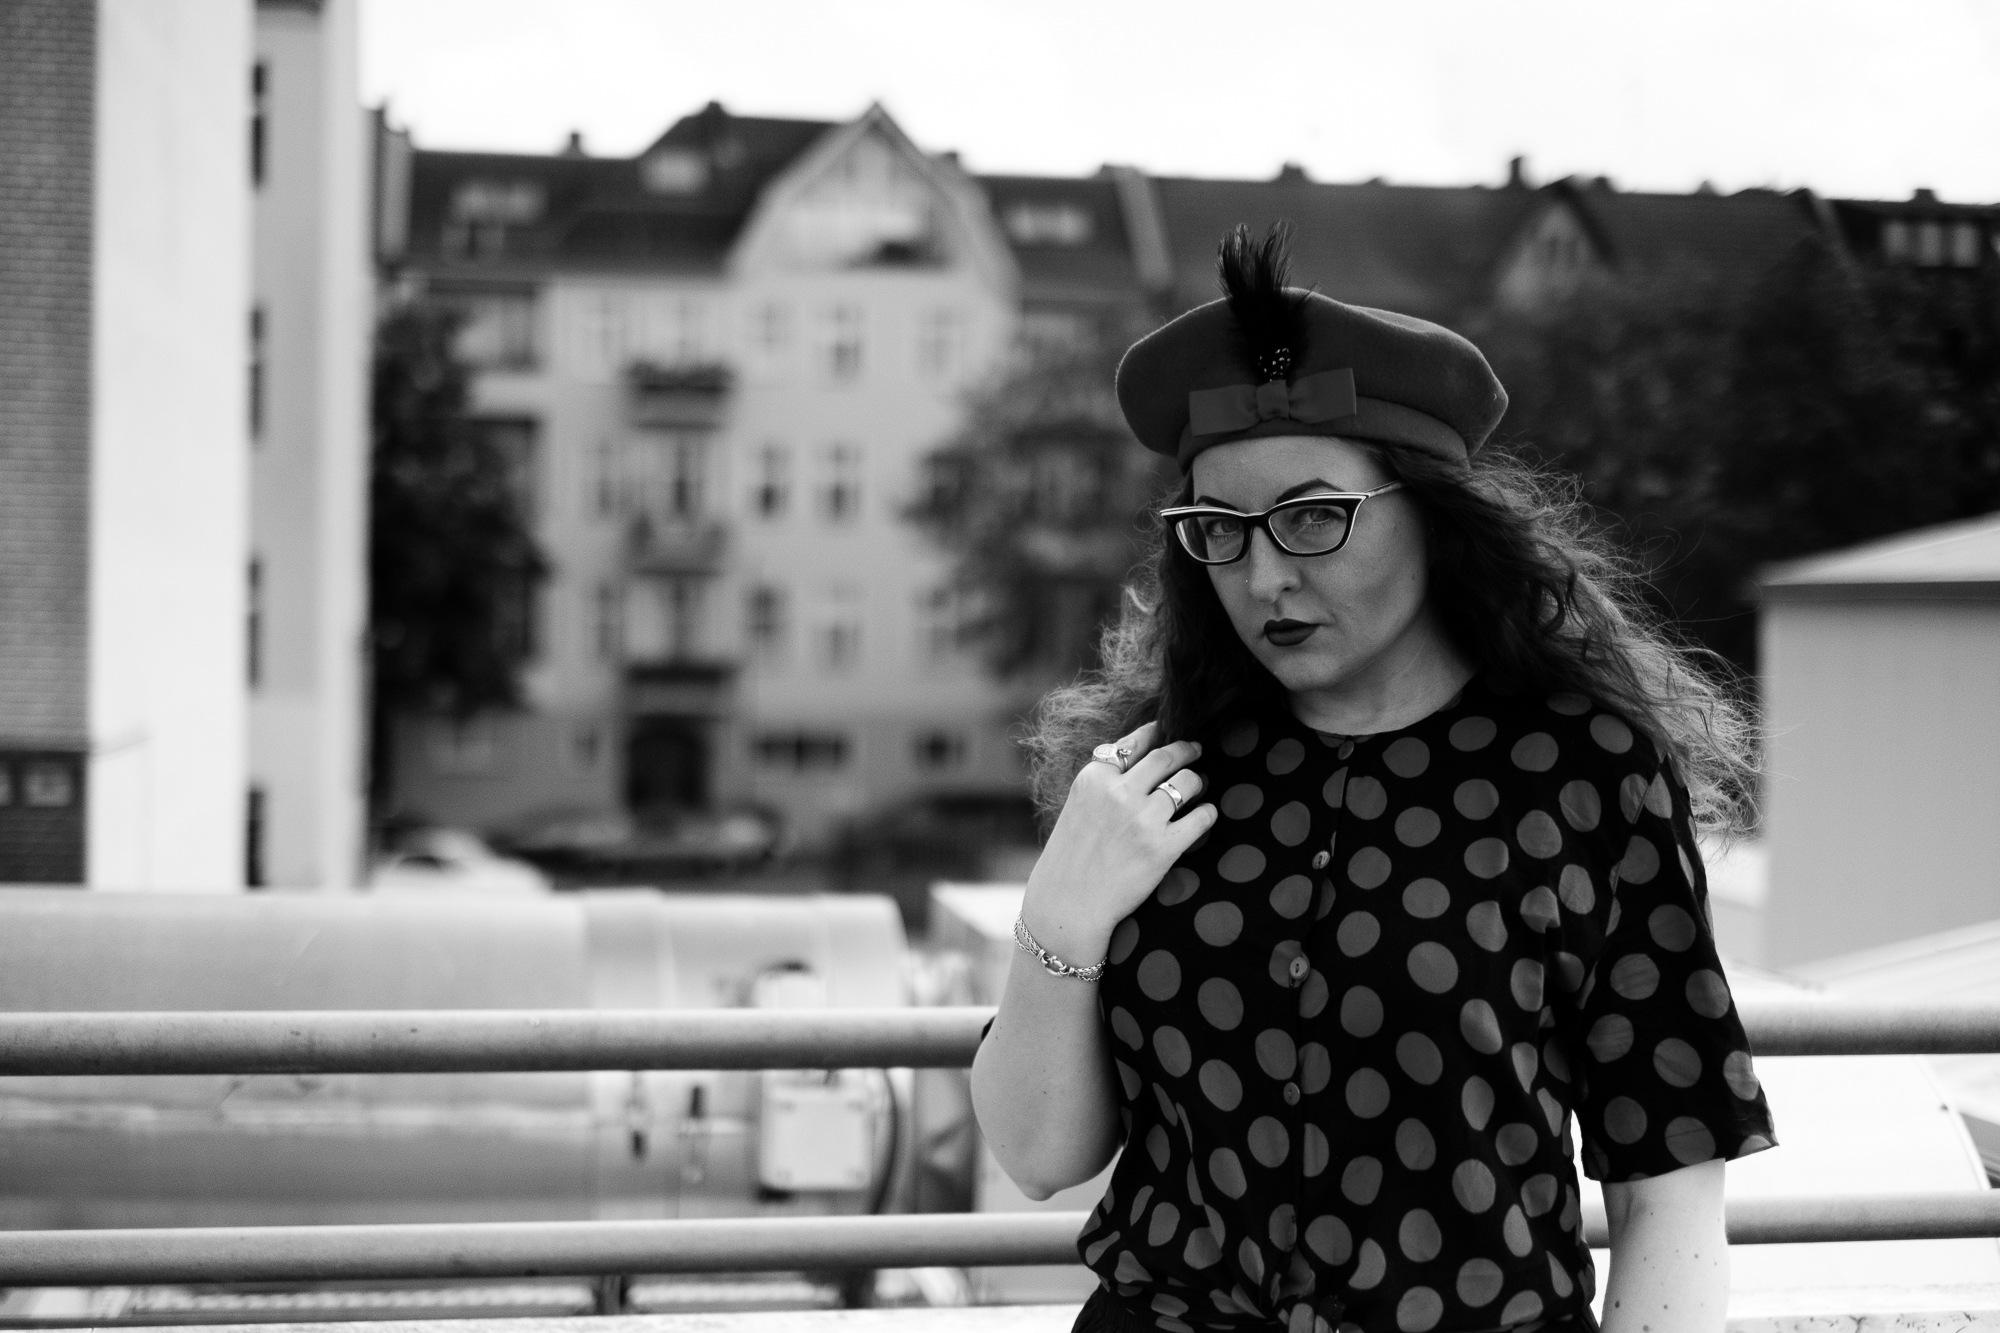 Girl posing on parking deck in Berlin